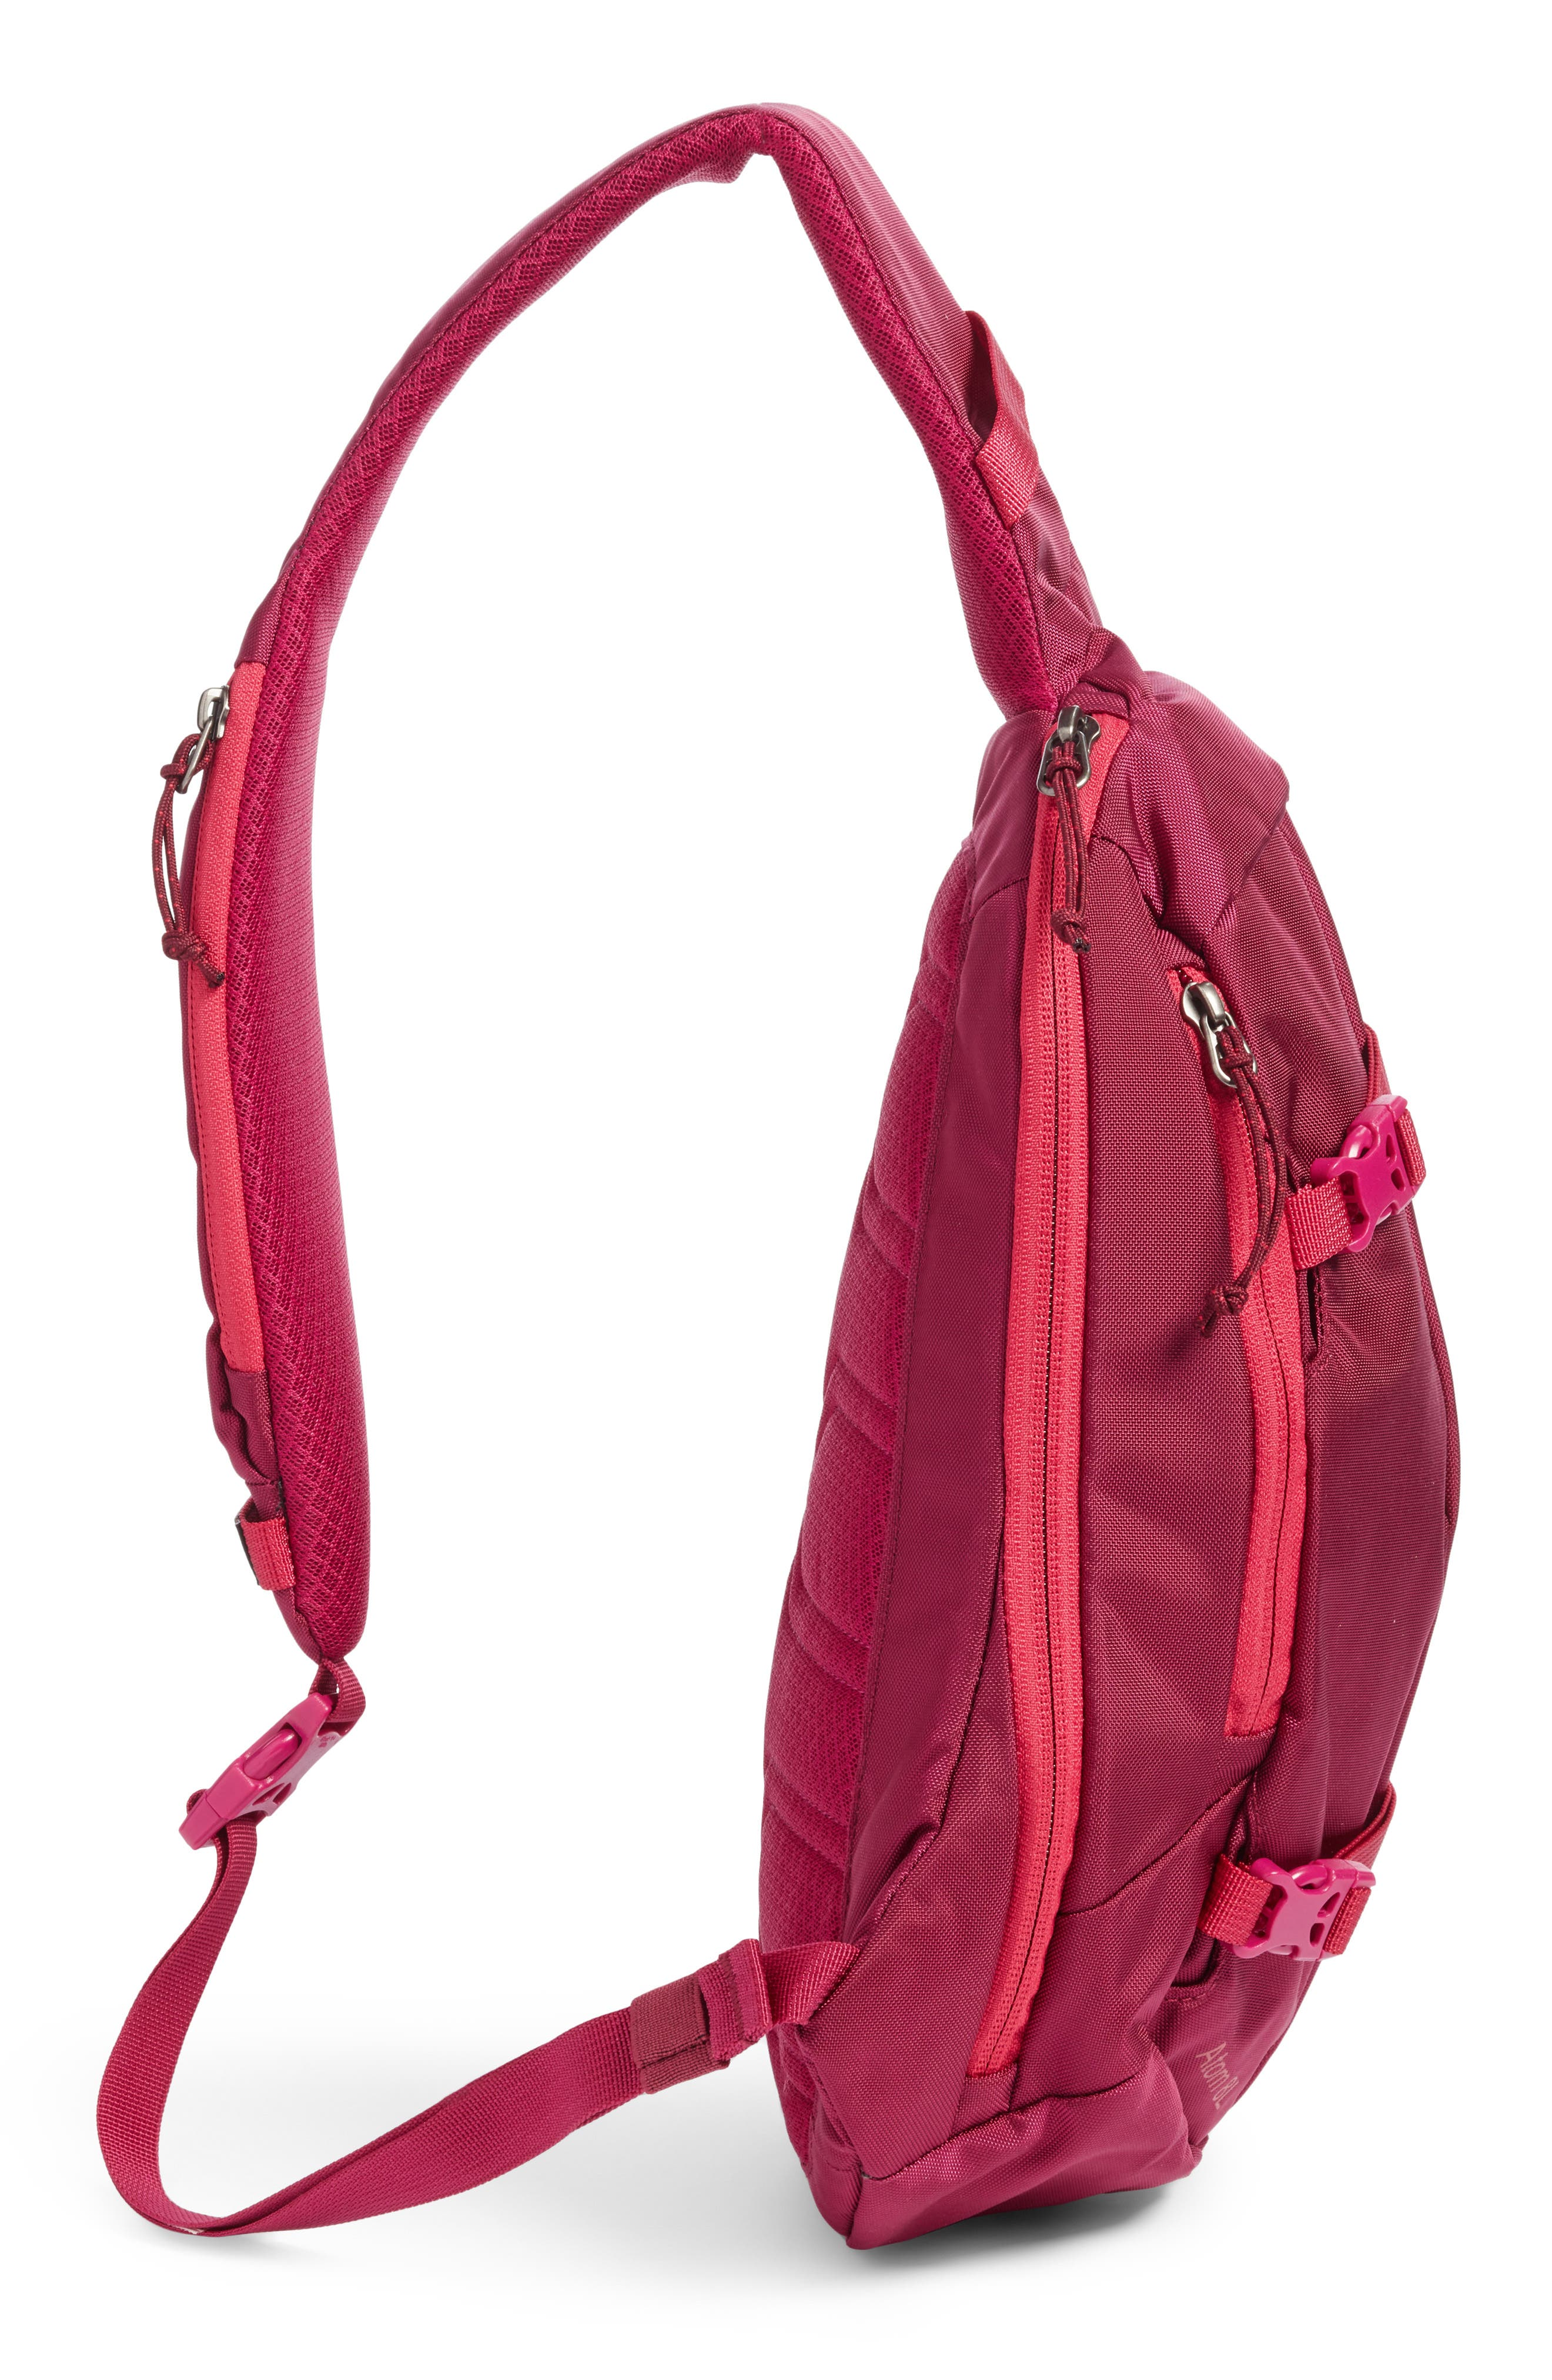 Atom 8L Sling Backpack,                             Alternate thumbnail 5, color,                             Magenta